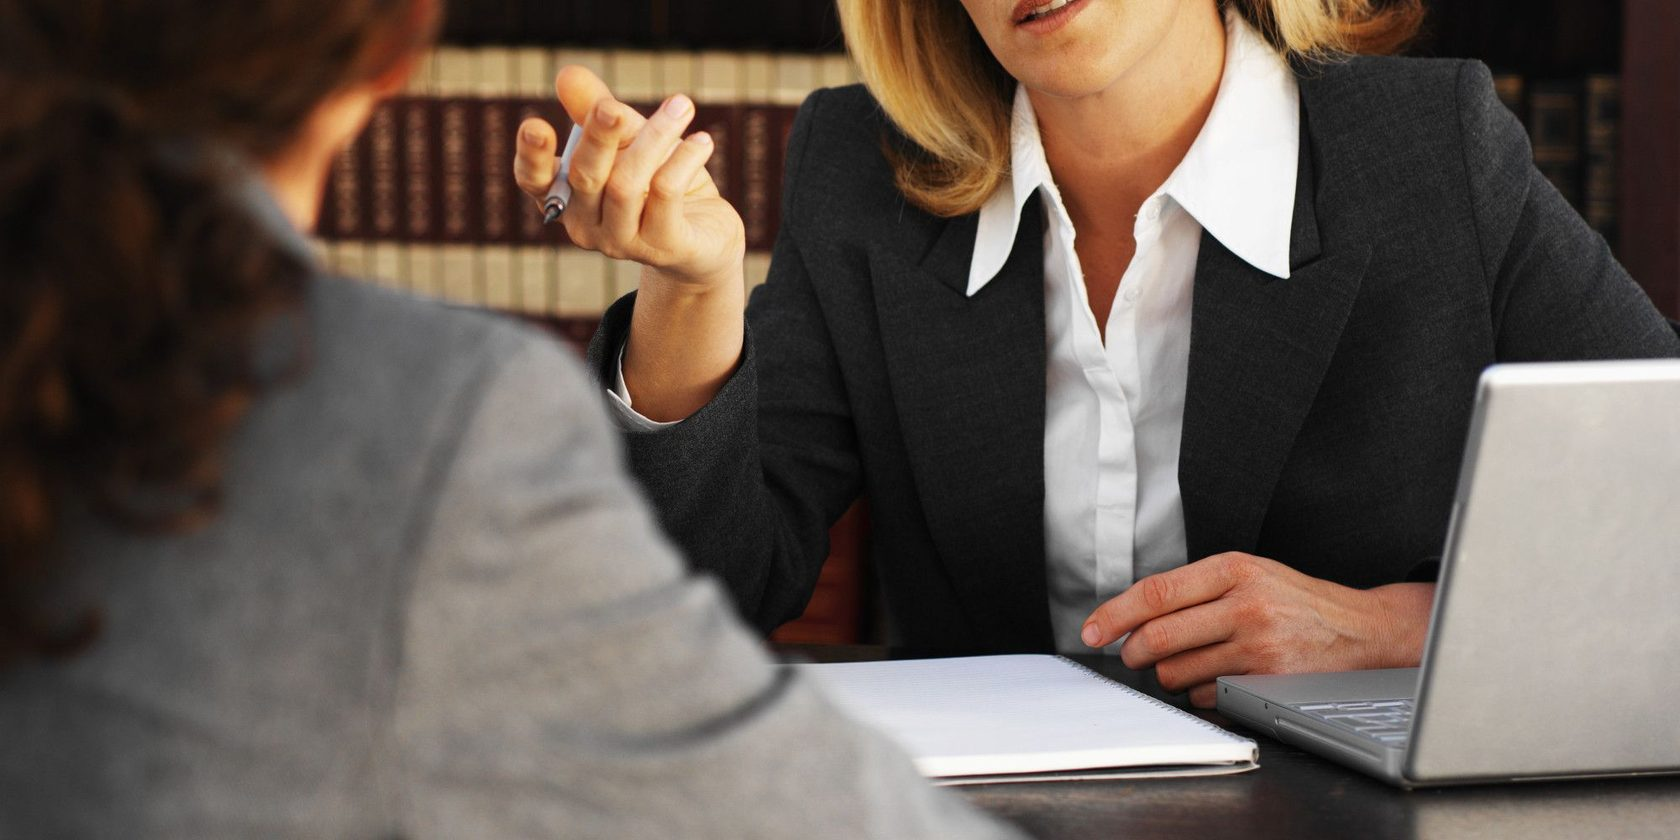 адвокат консультант